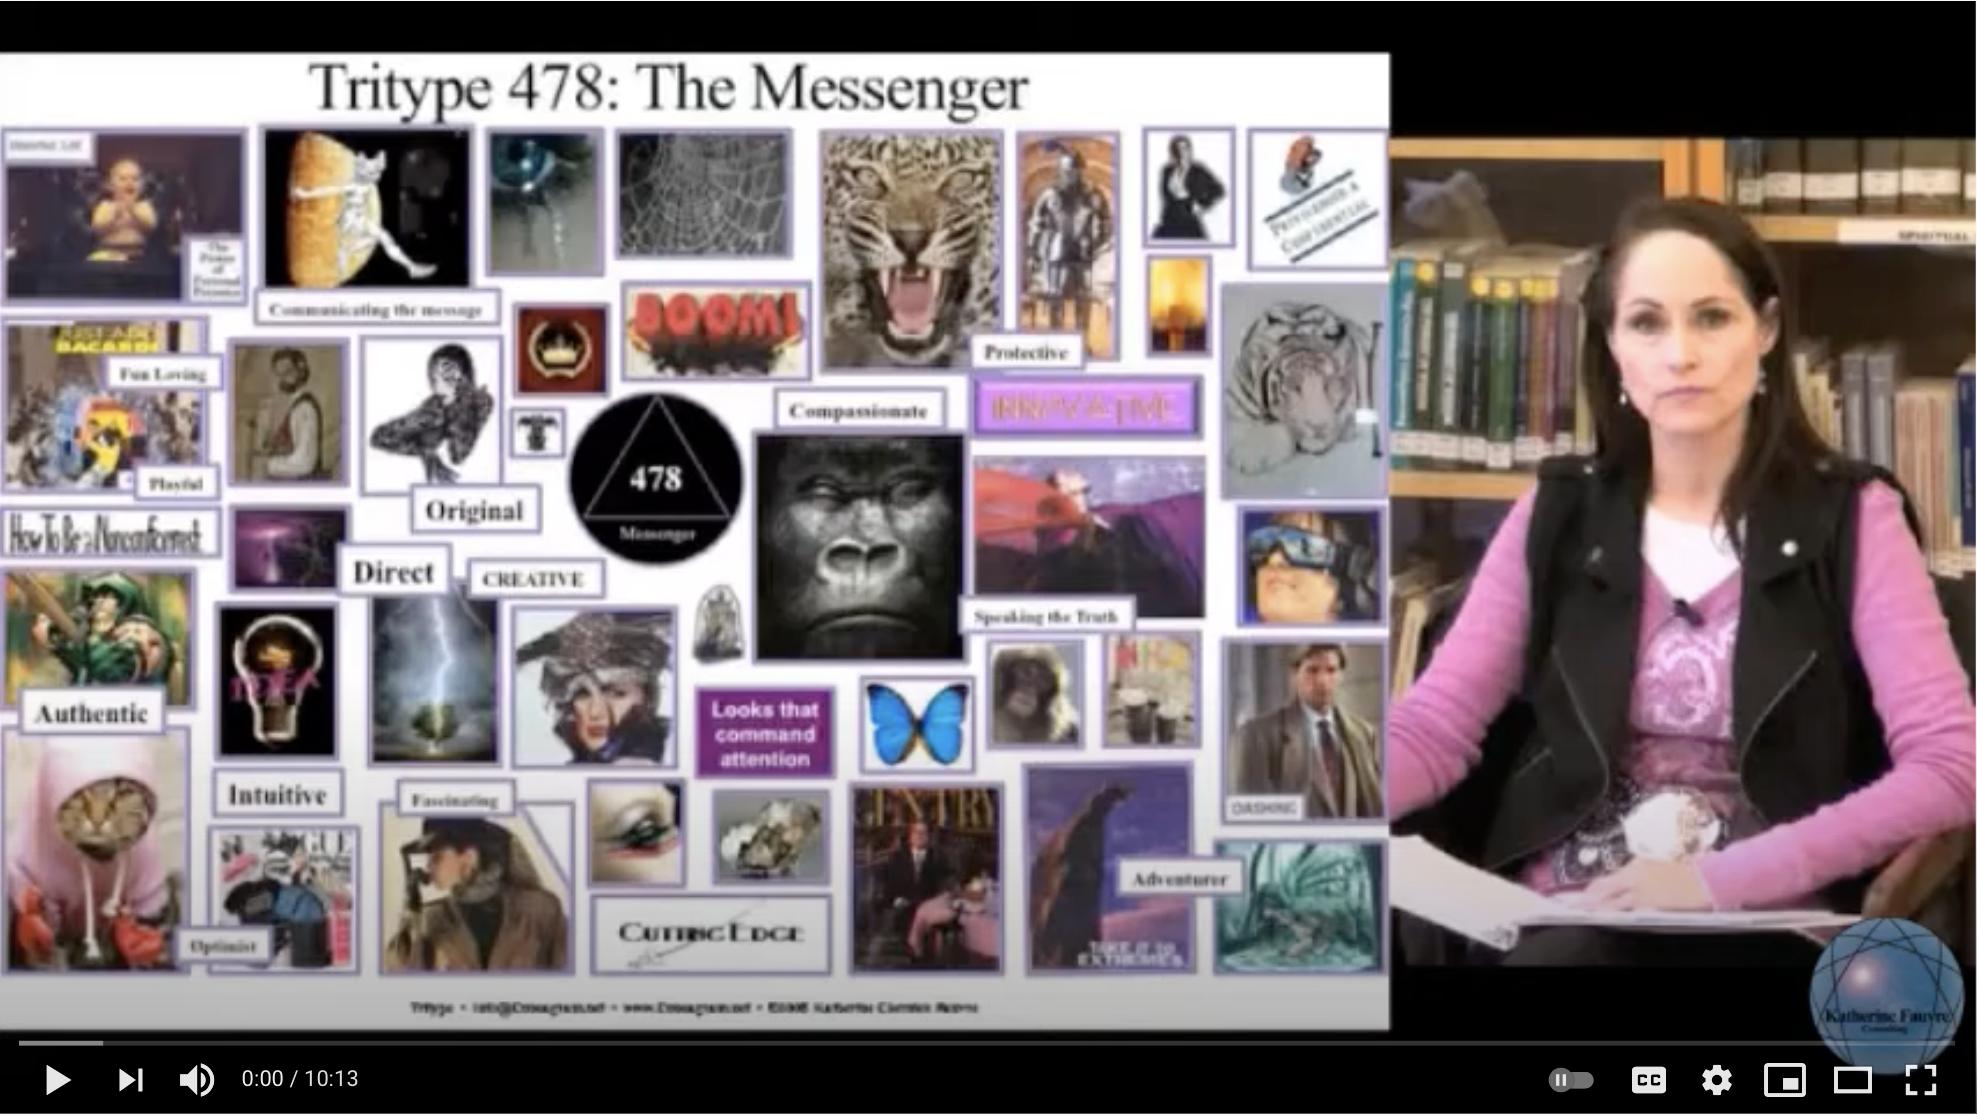 478 Tritype Thumbnail screenshot 3-3-21